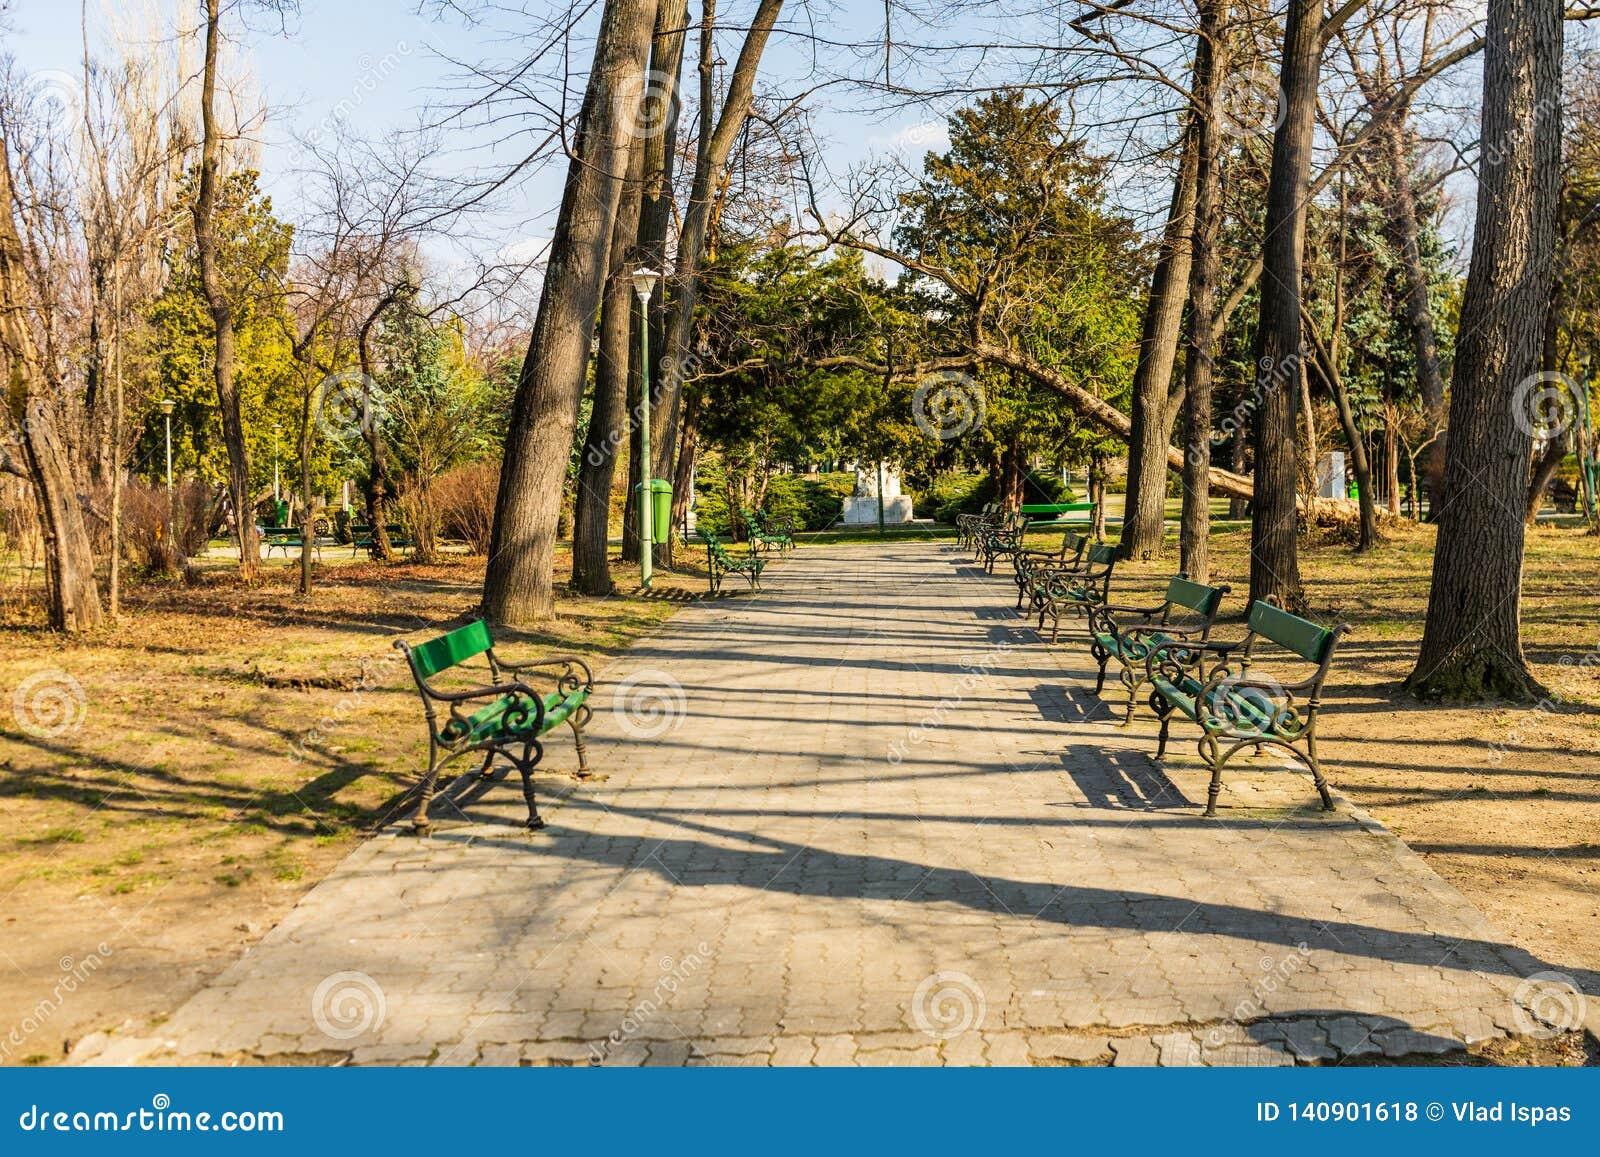 Carol Park in Bucharest, Romania. Empty alley